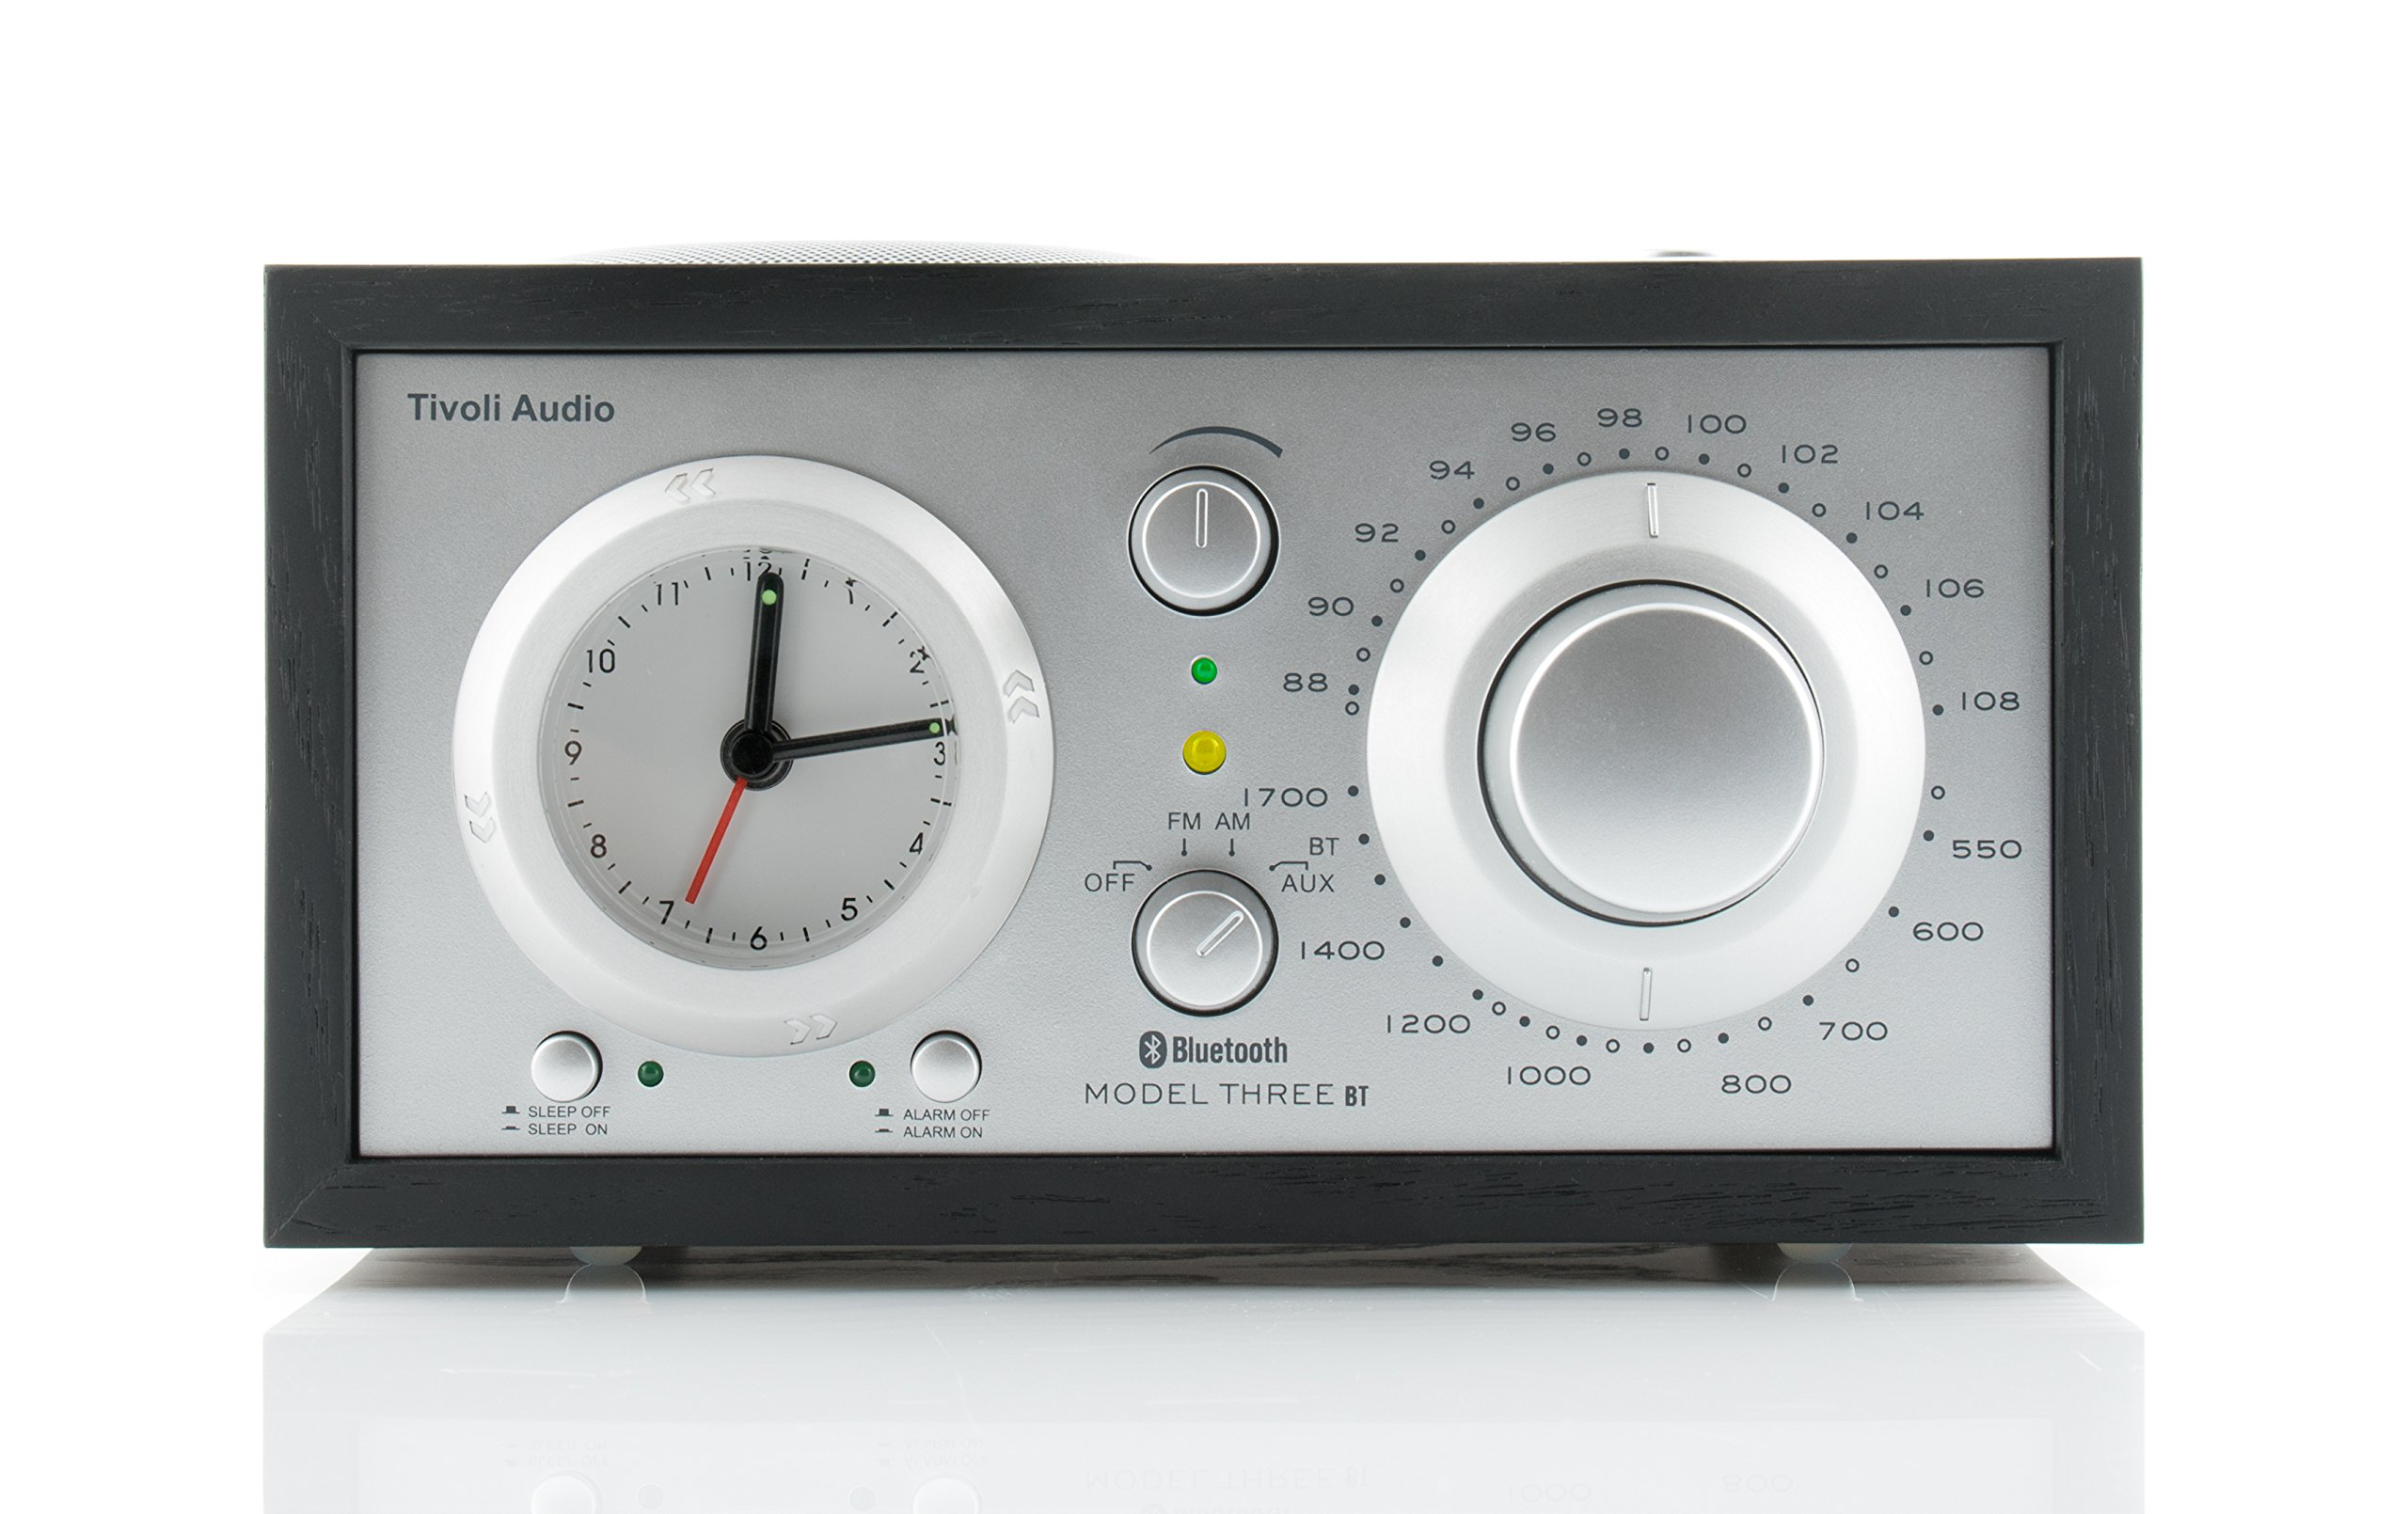 Tivoli Audio Model Three BT in Black/Silver